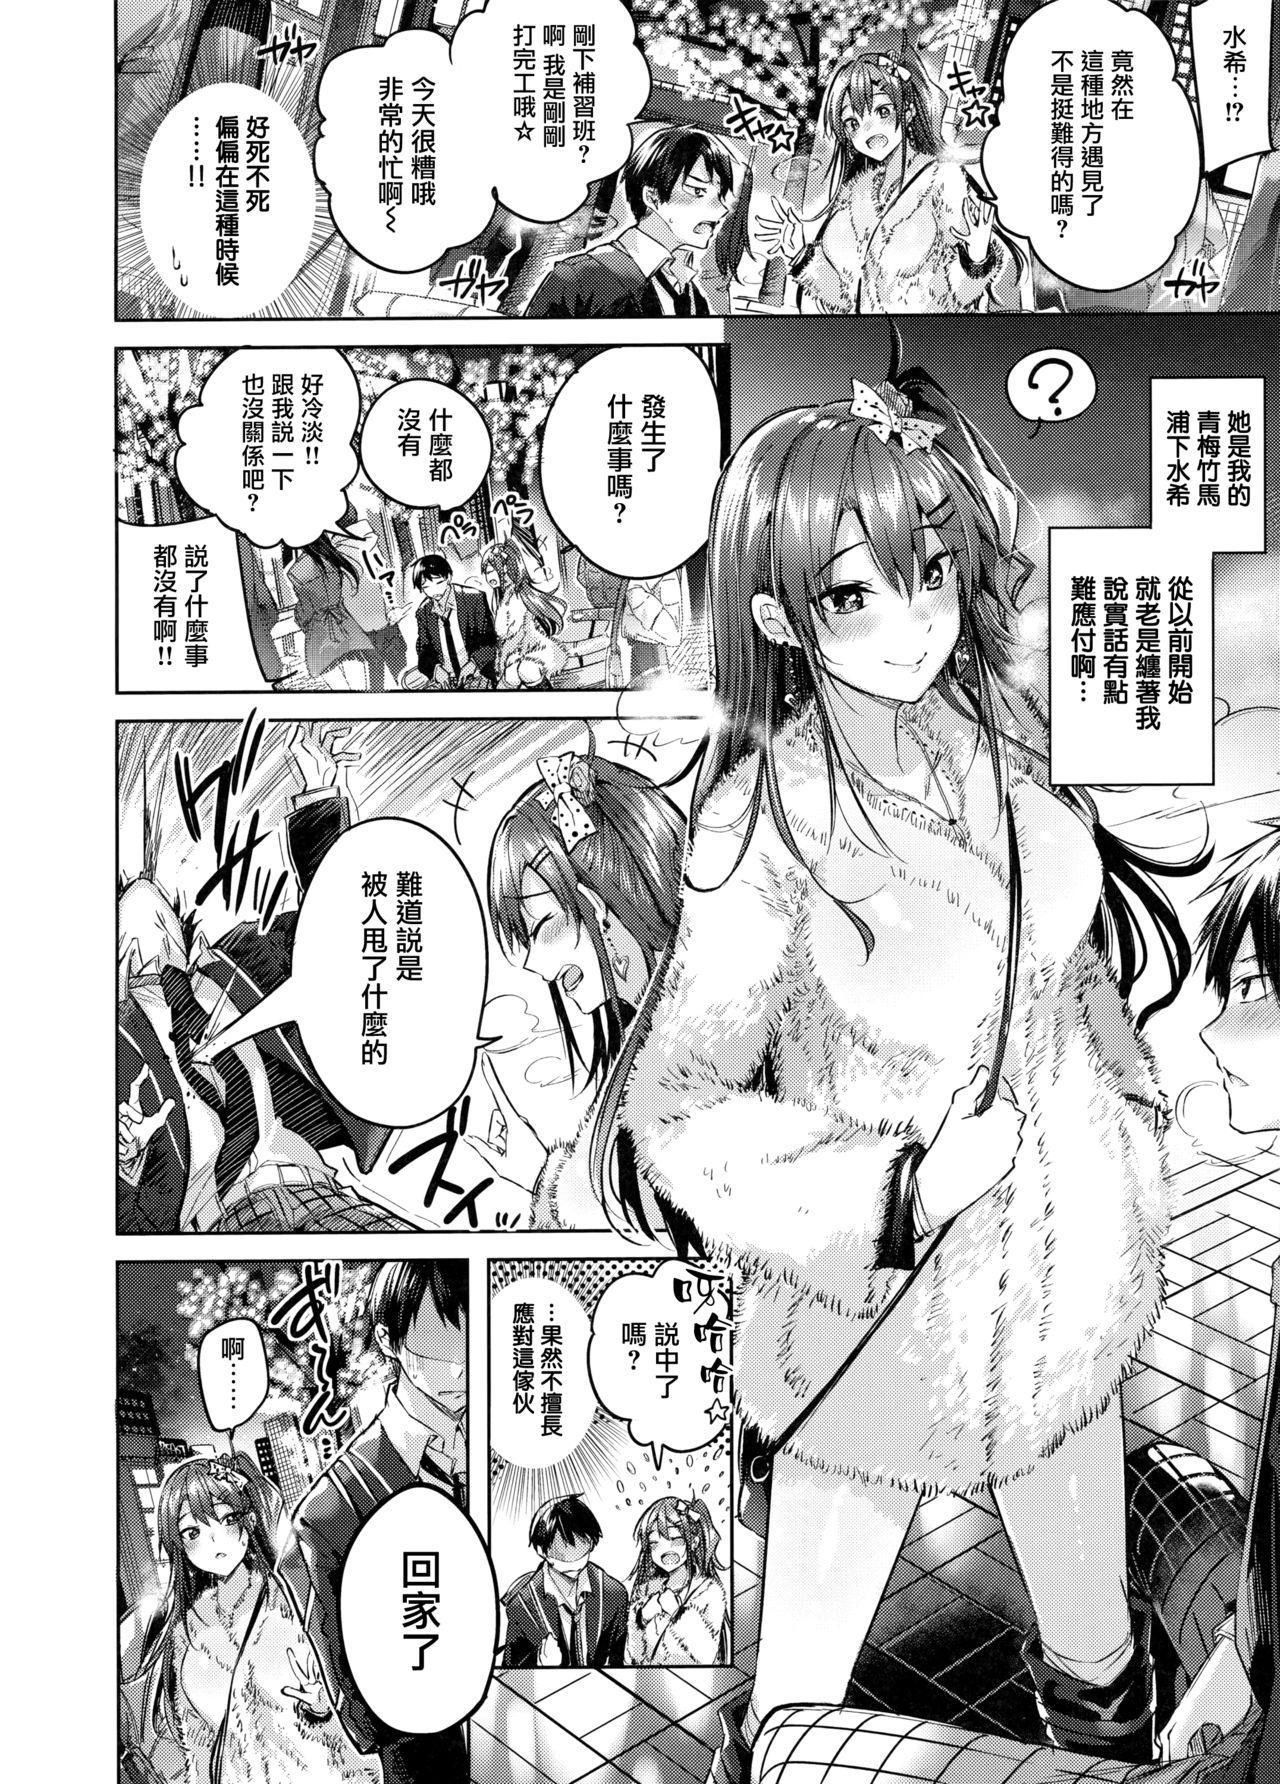 [Kakao] Nakadashi Strike! - Winning strike! Ch. 1-2  [Chinese] [兔司姬漢化組] 11